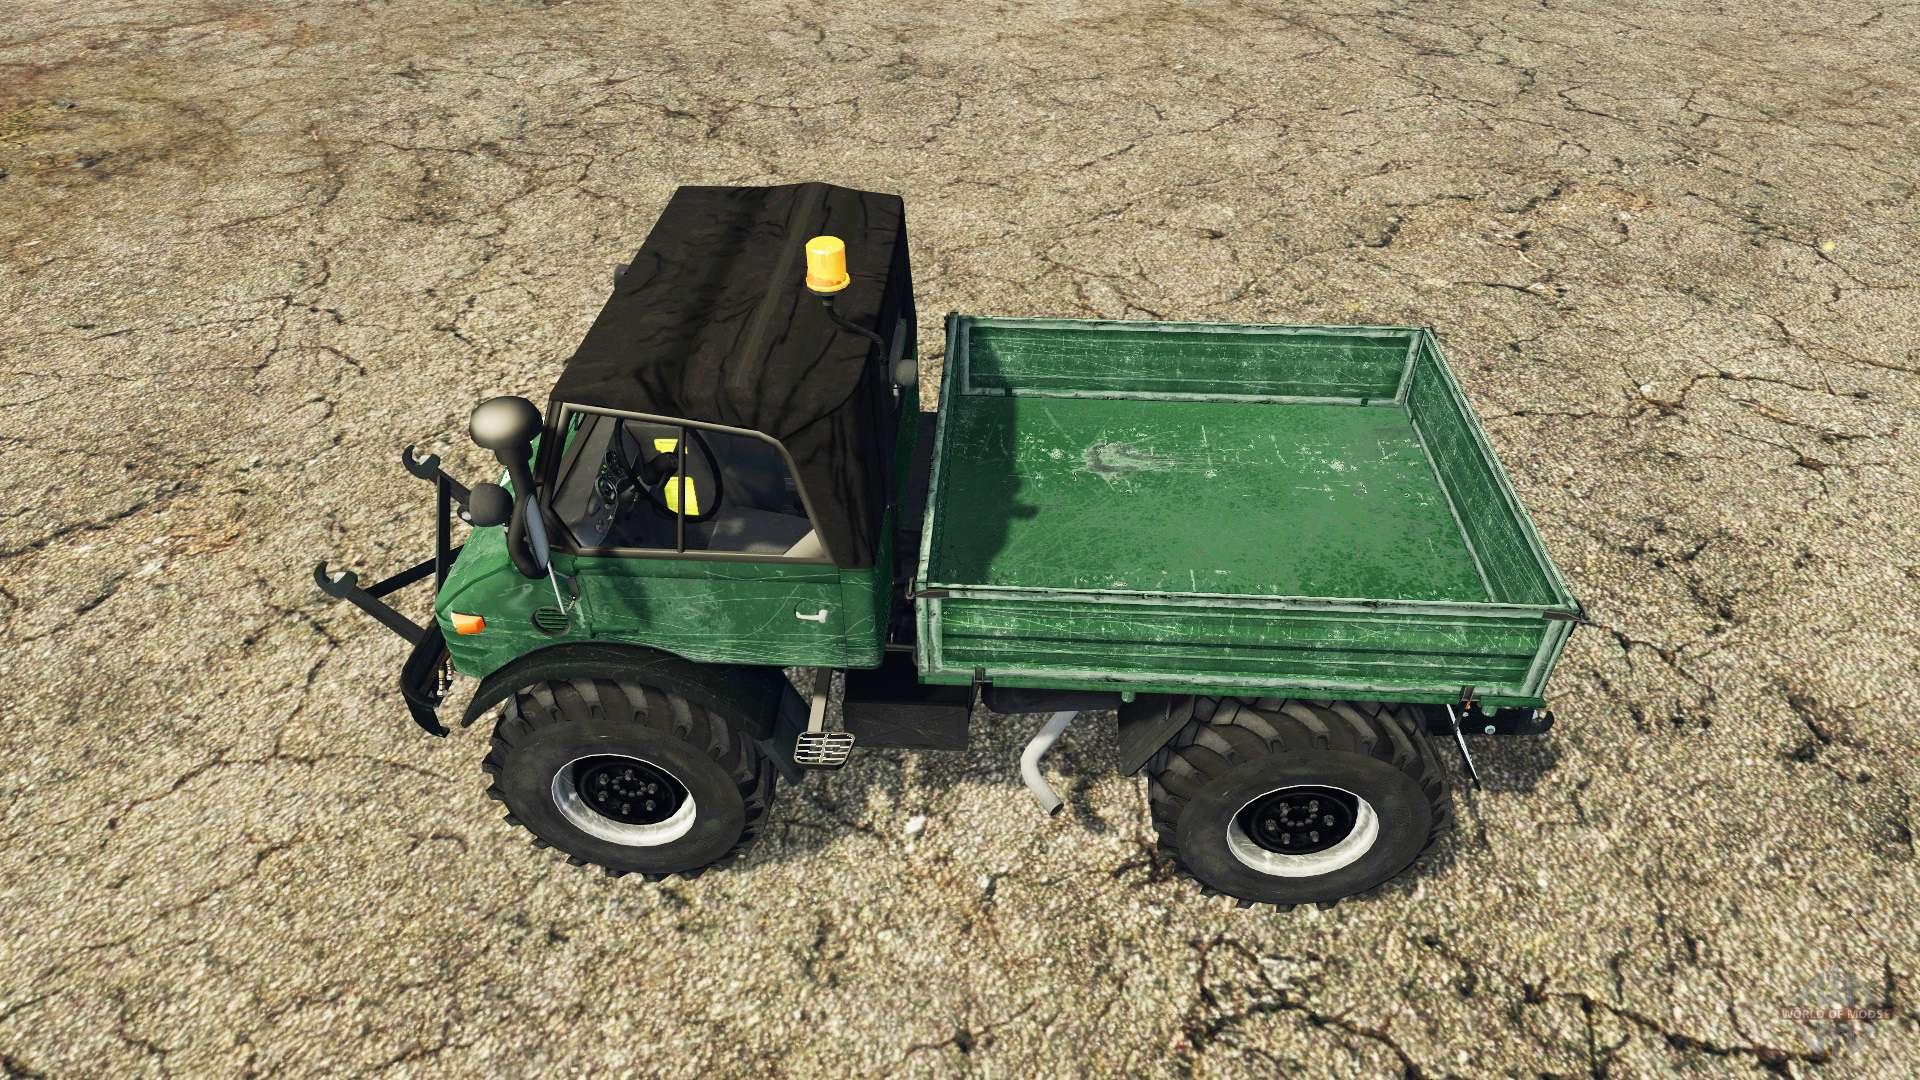 Mercedes-Benz Unimog 406 1973 v2.0 für Farming Simulator 2015